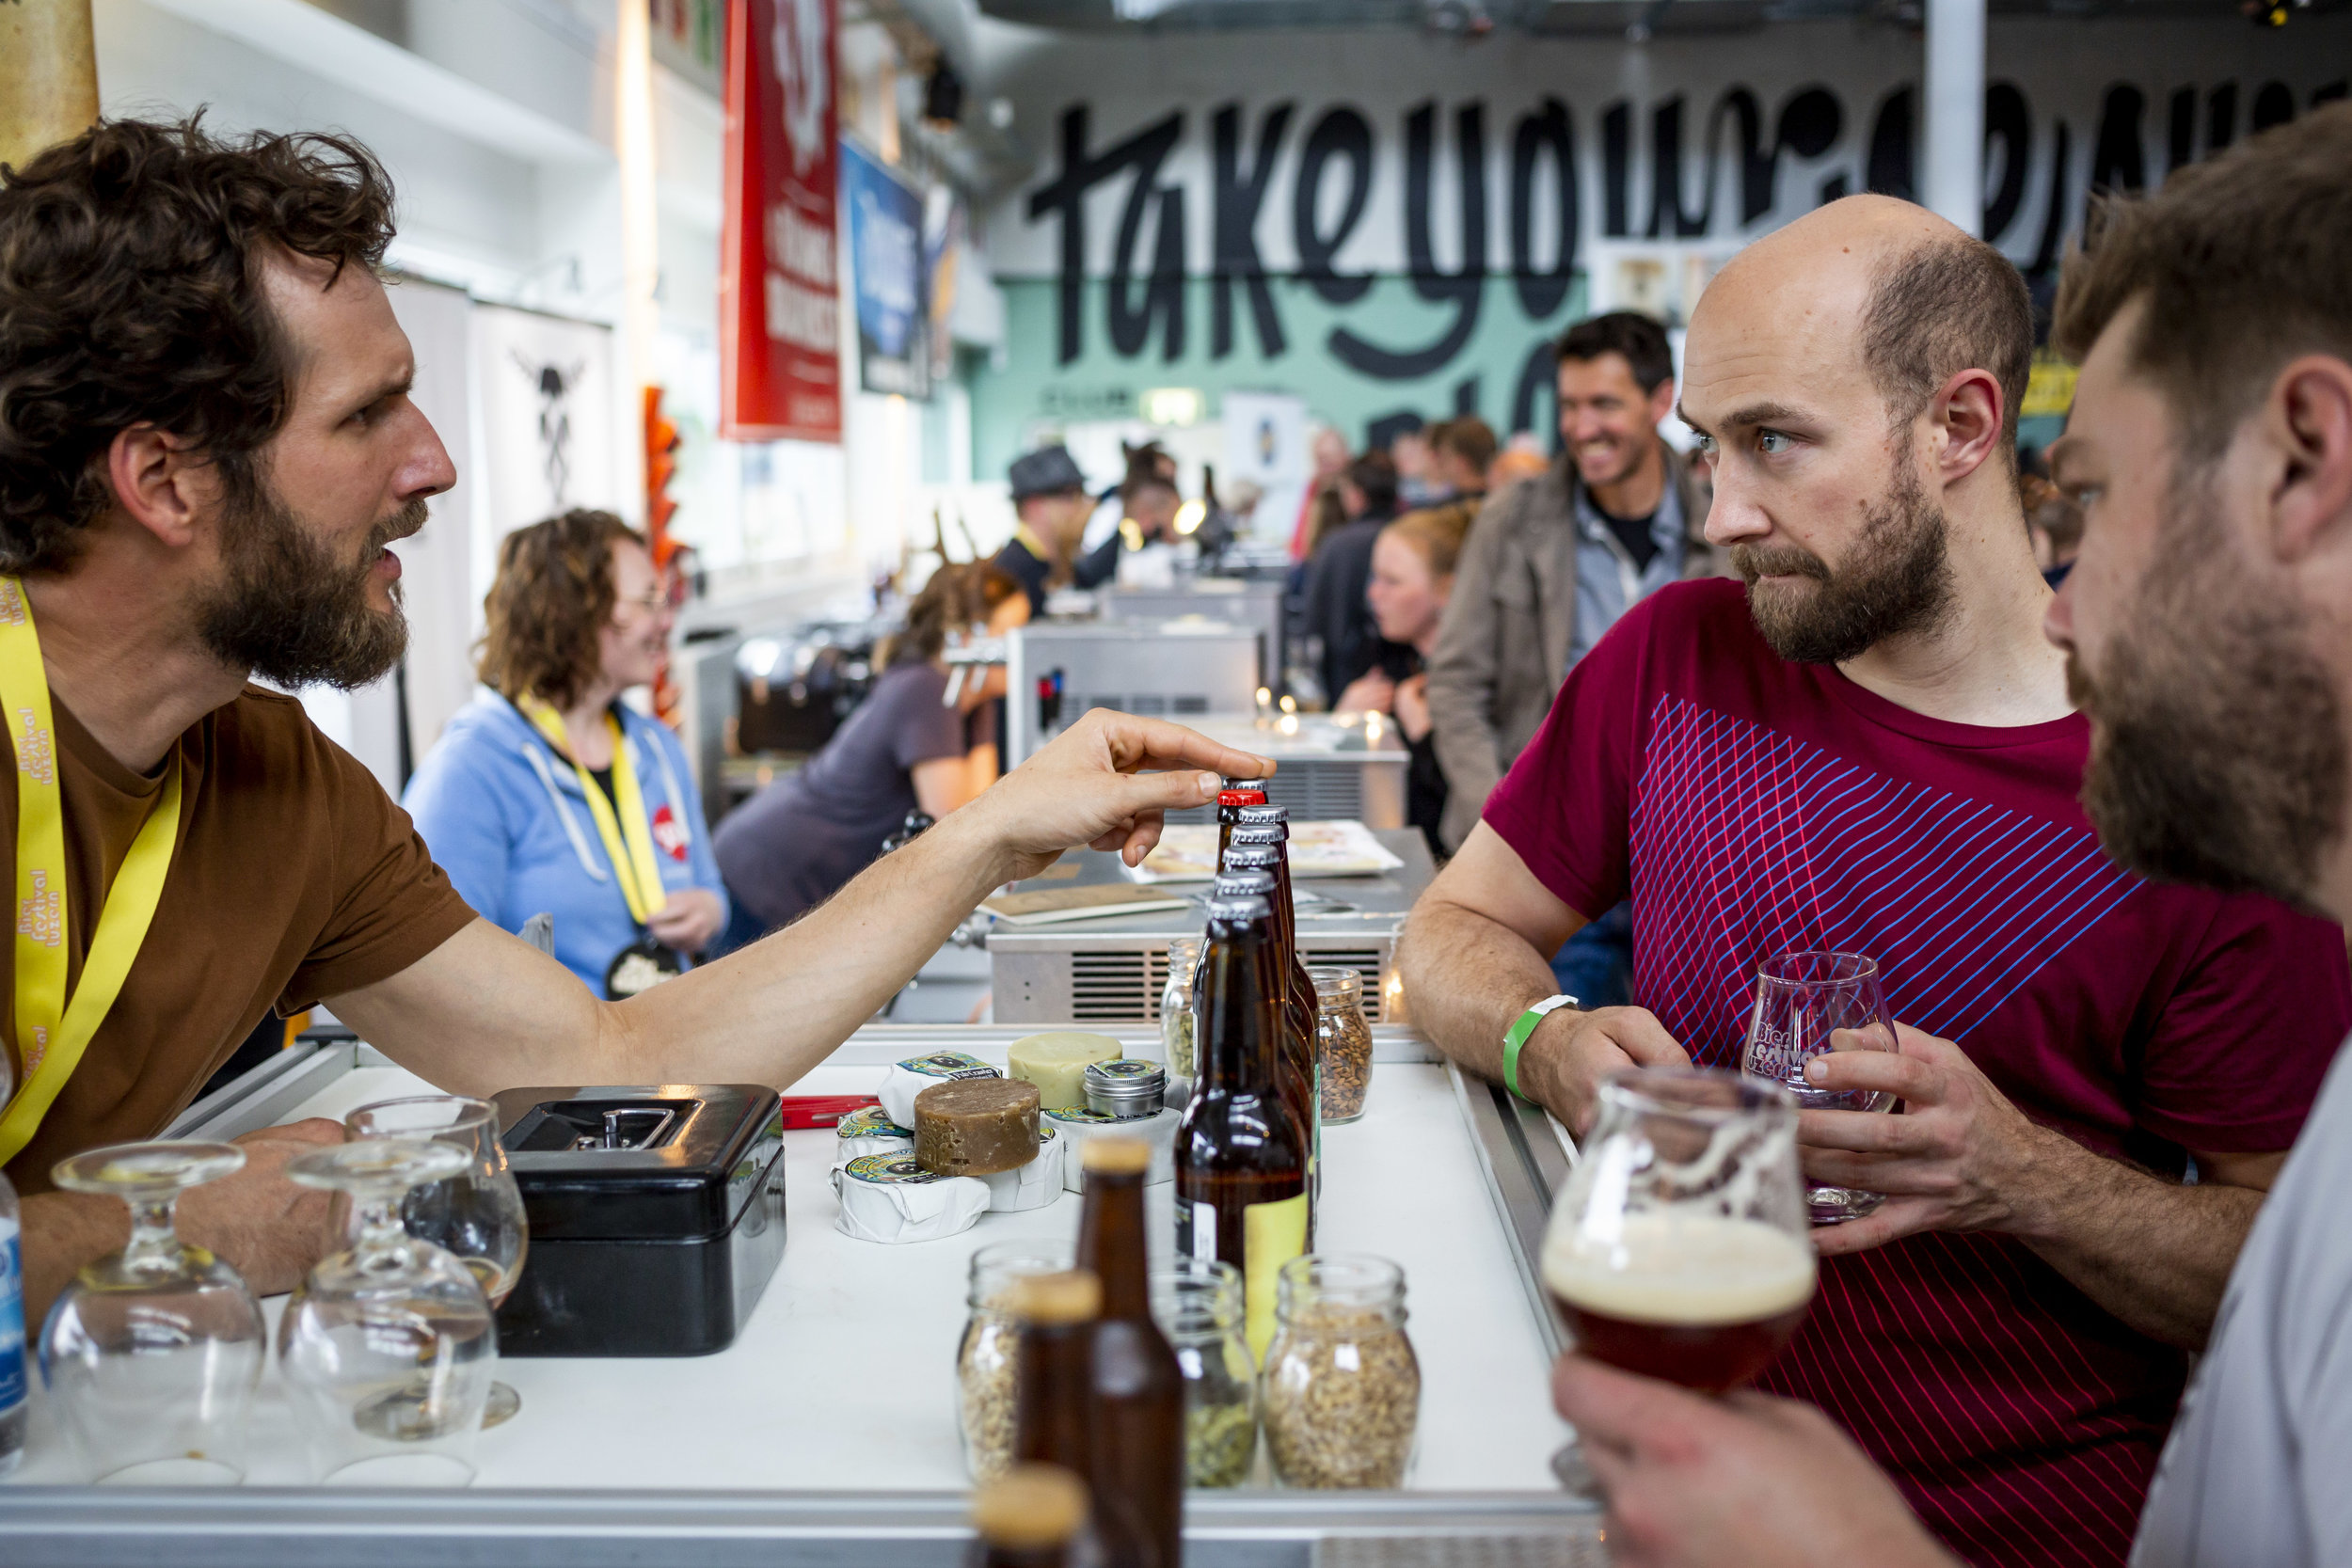 BierfestivalLuzern-52.jpg